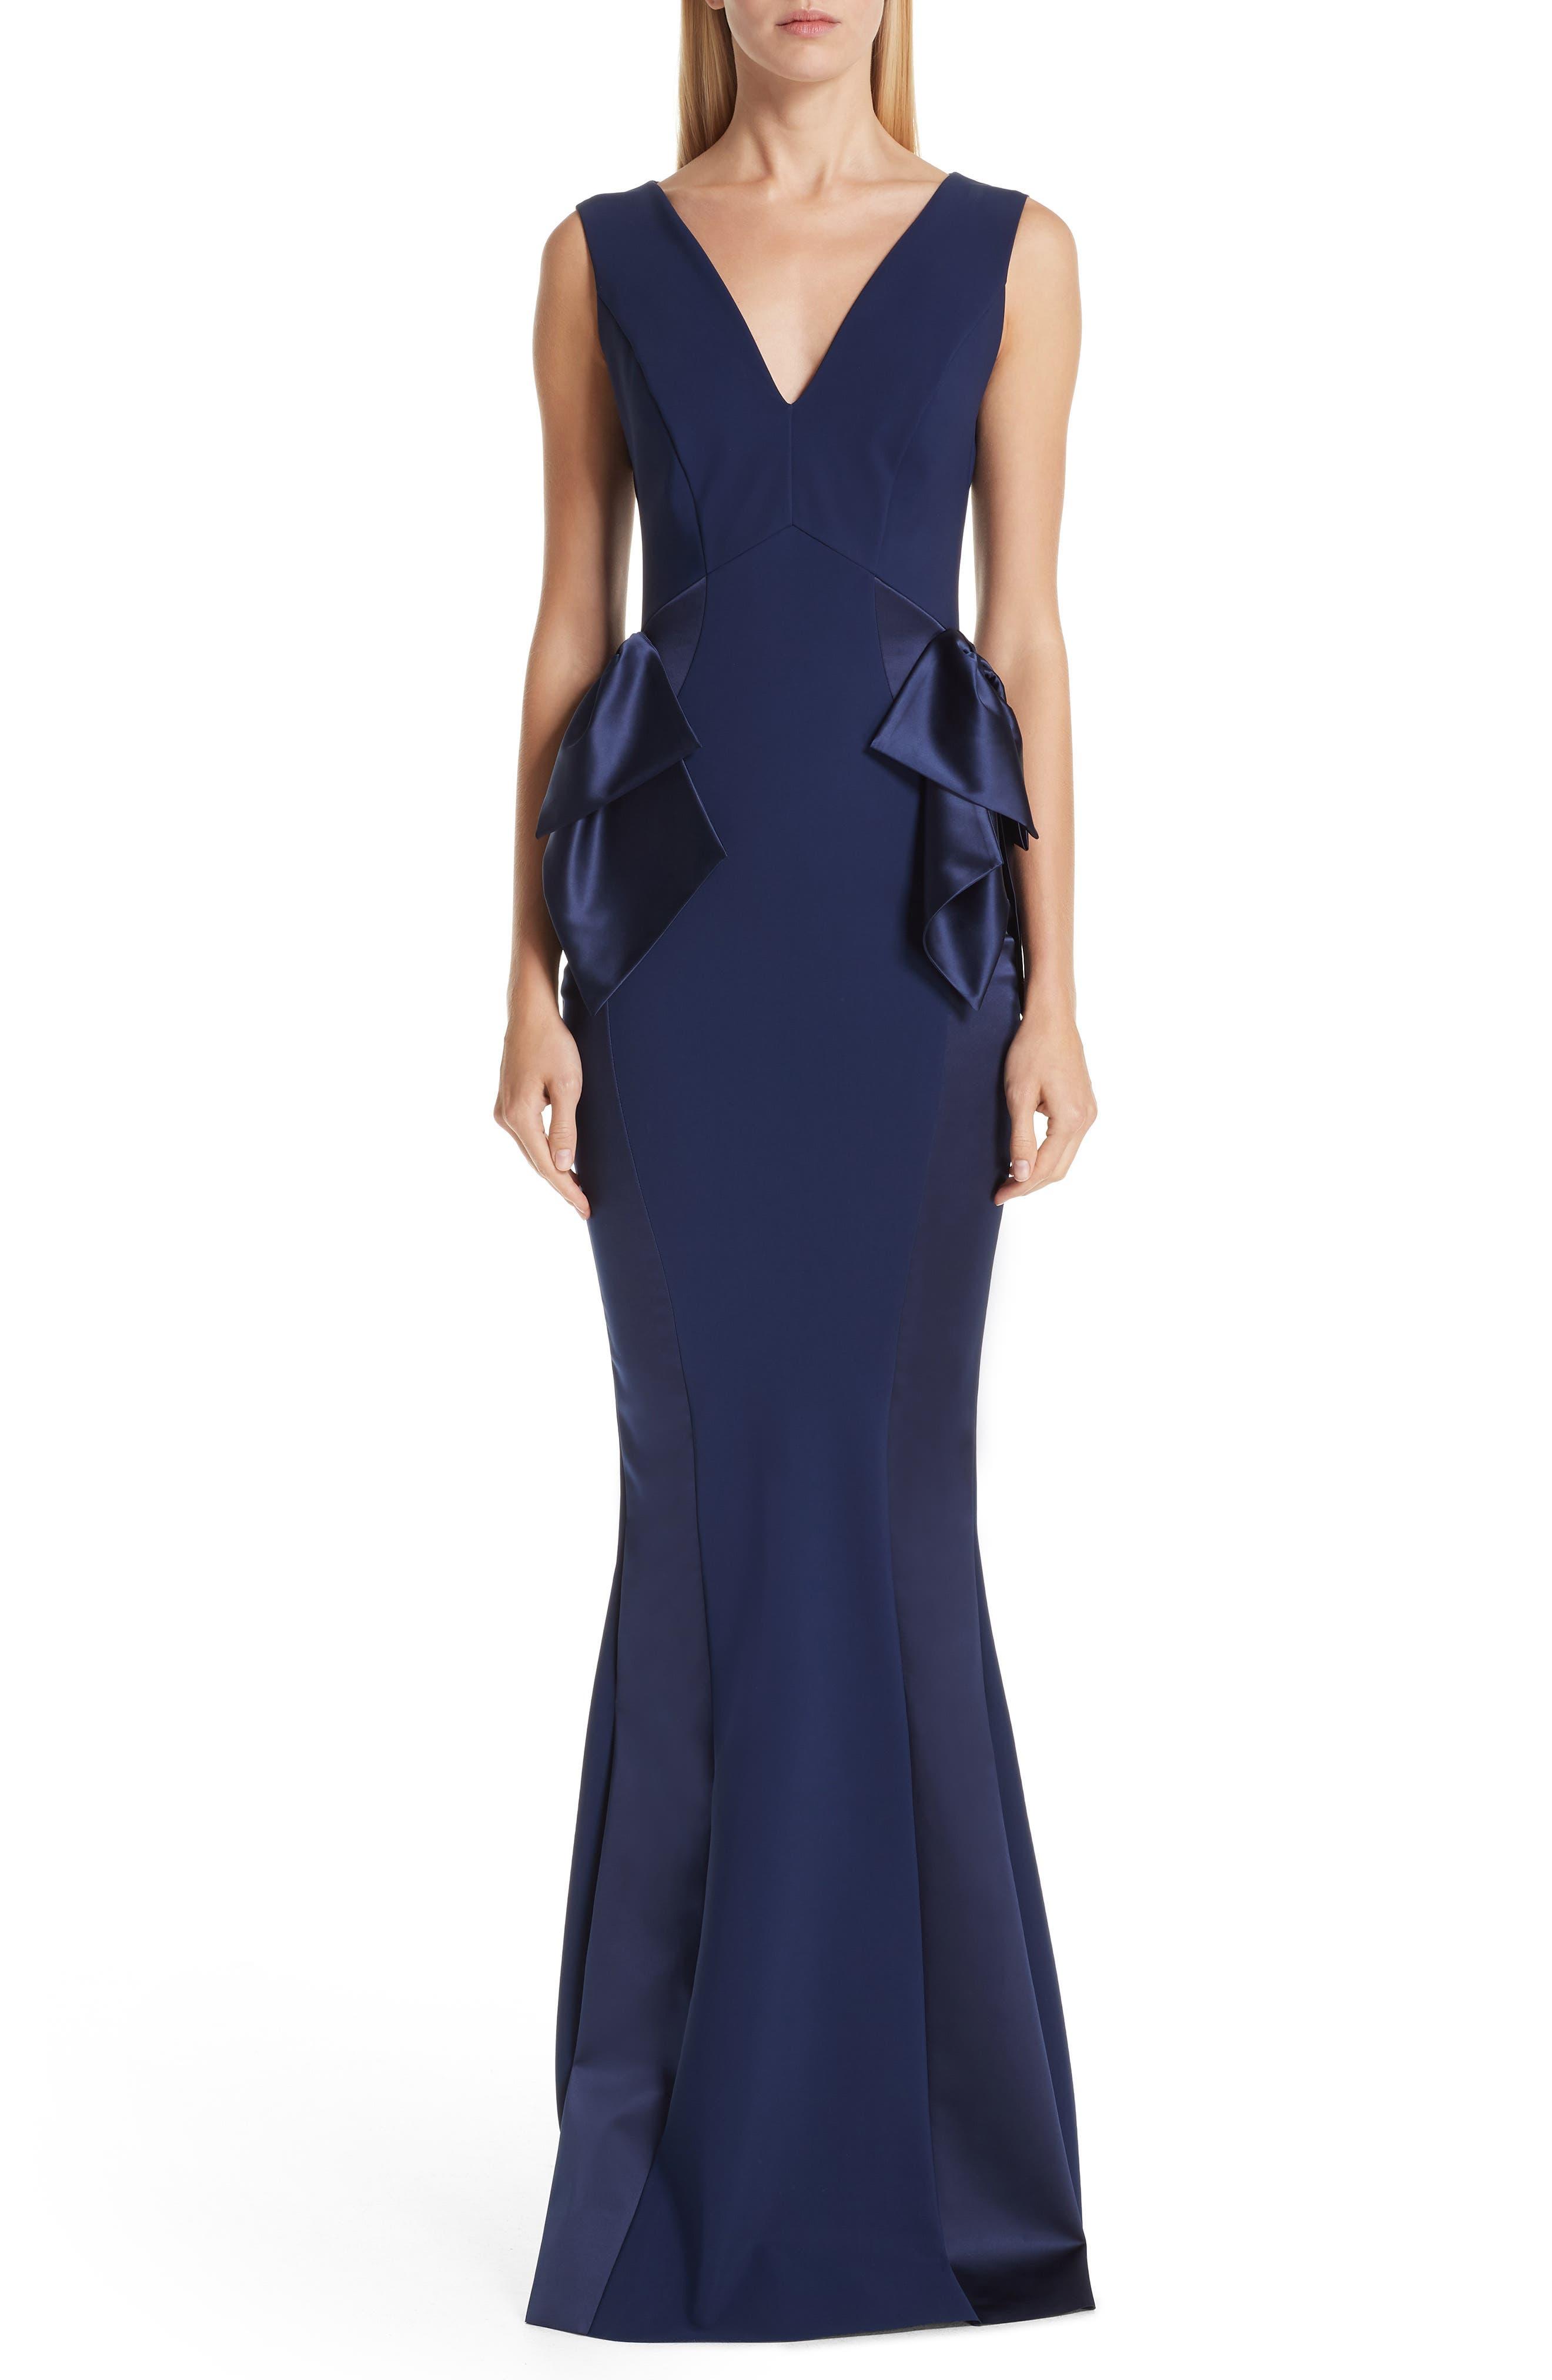 Chiara Boni La Petite Robe Macaria Satin Bow Trumpet Gown, Blue